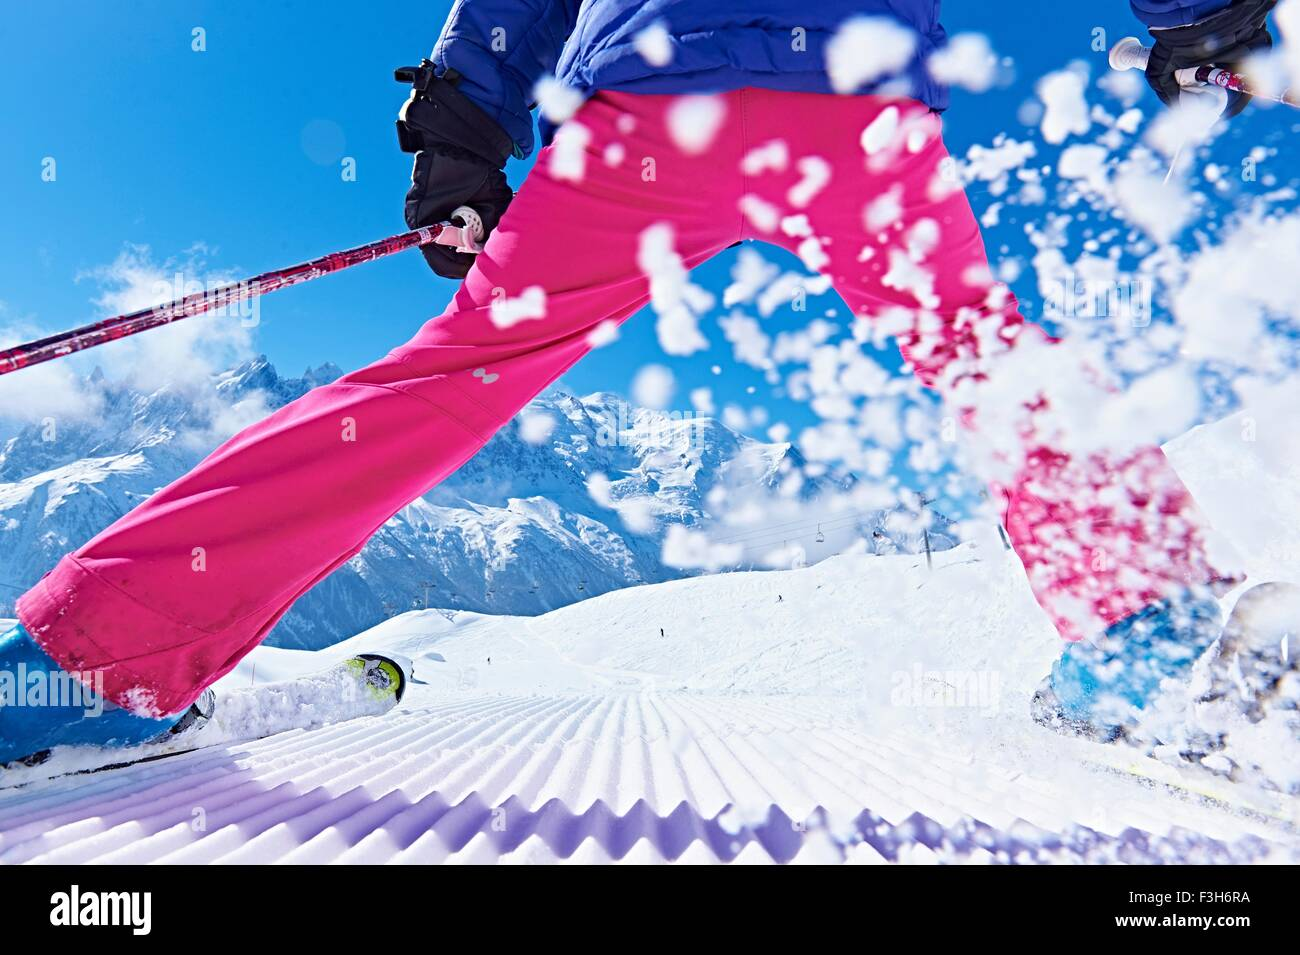 Rear view of skier, Chamonix, France - Stock Image